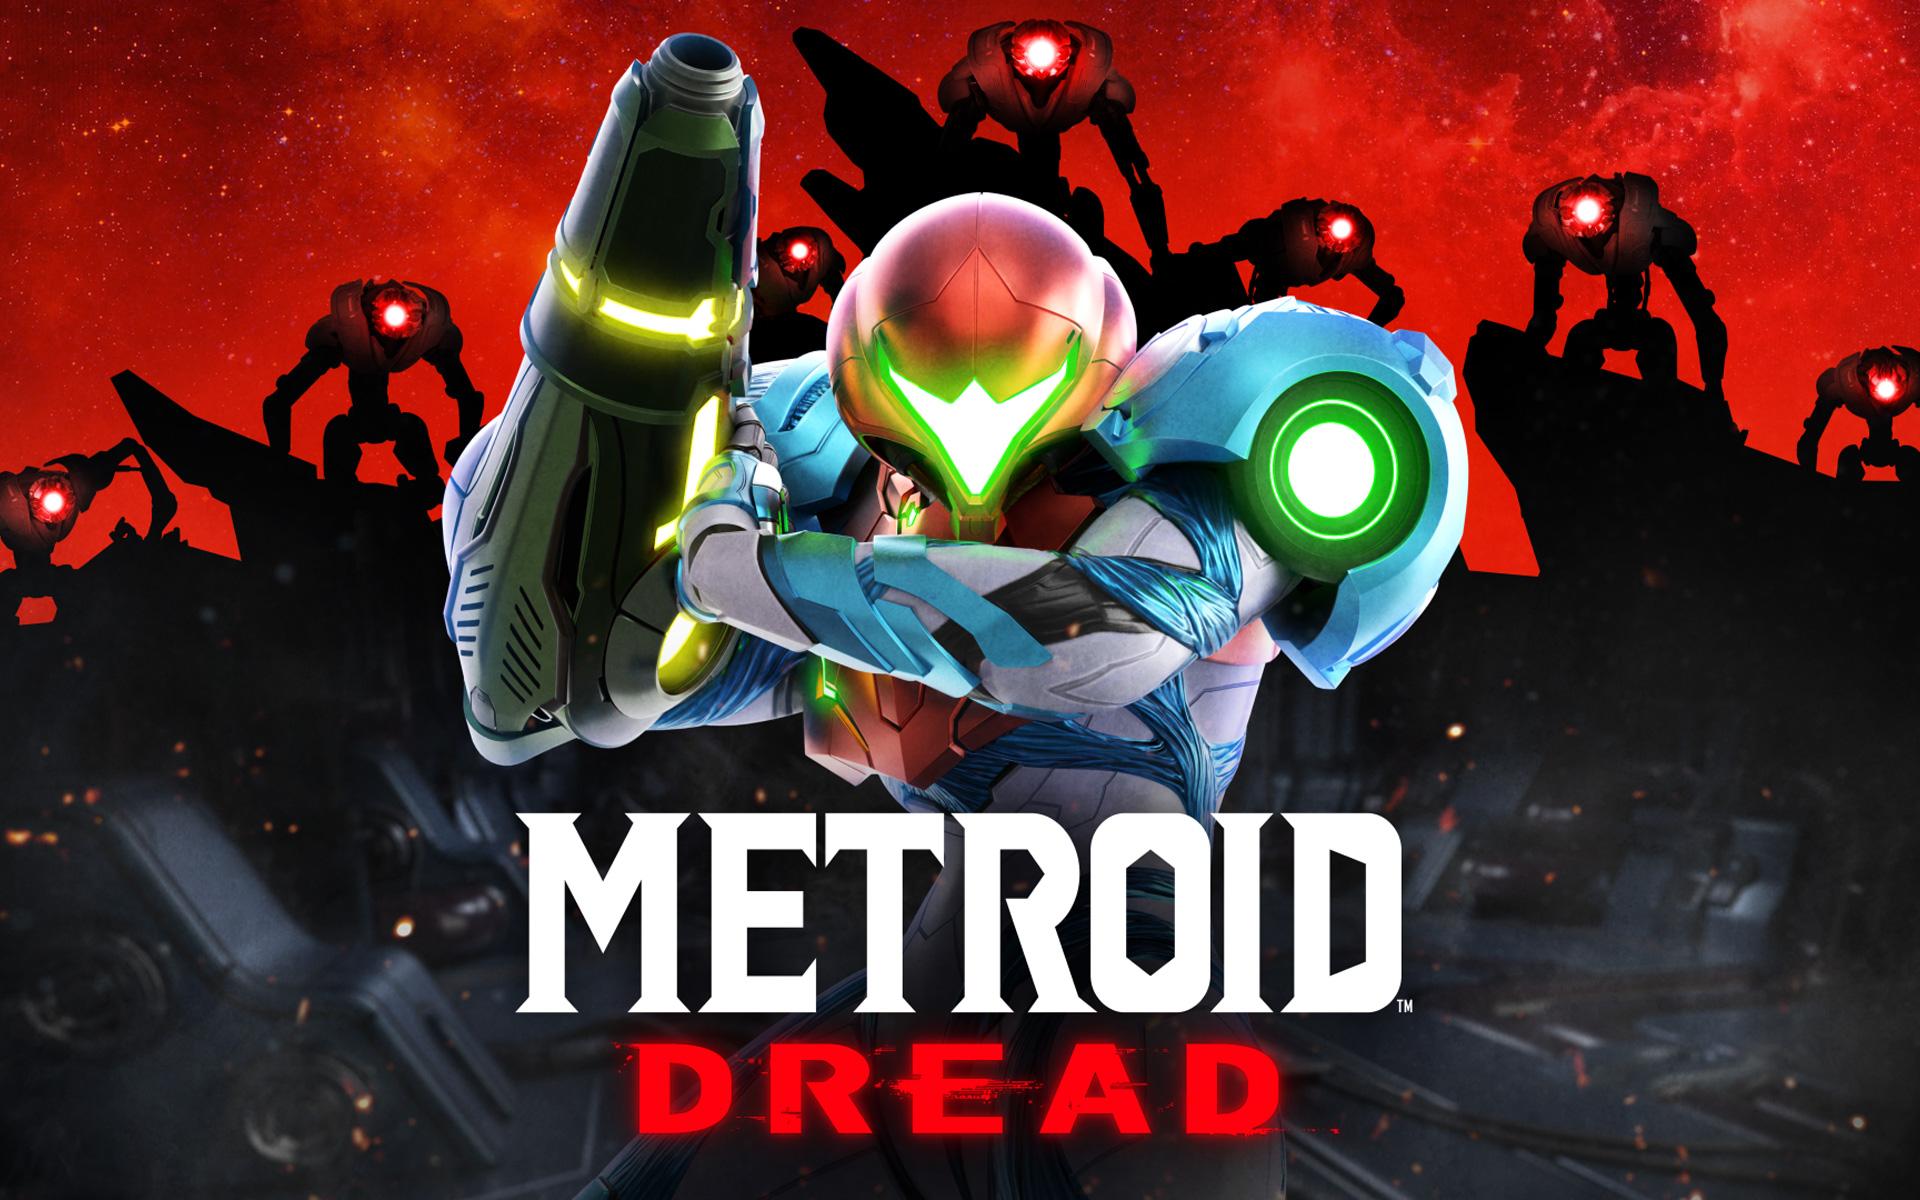 Free Metroid Dread Wallpaper in 1920x1200